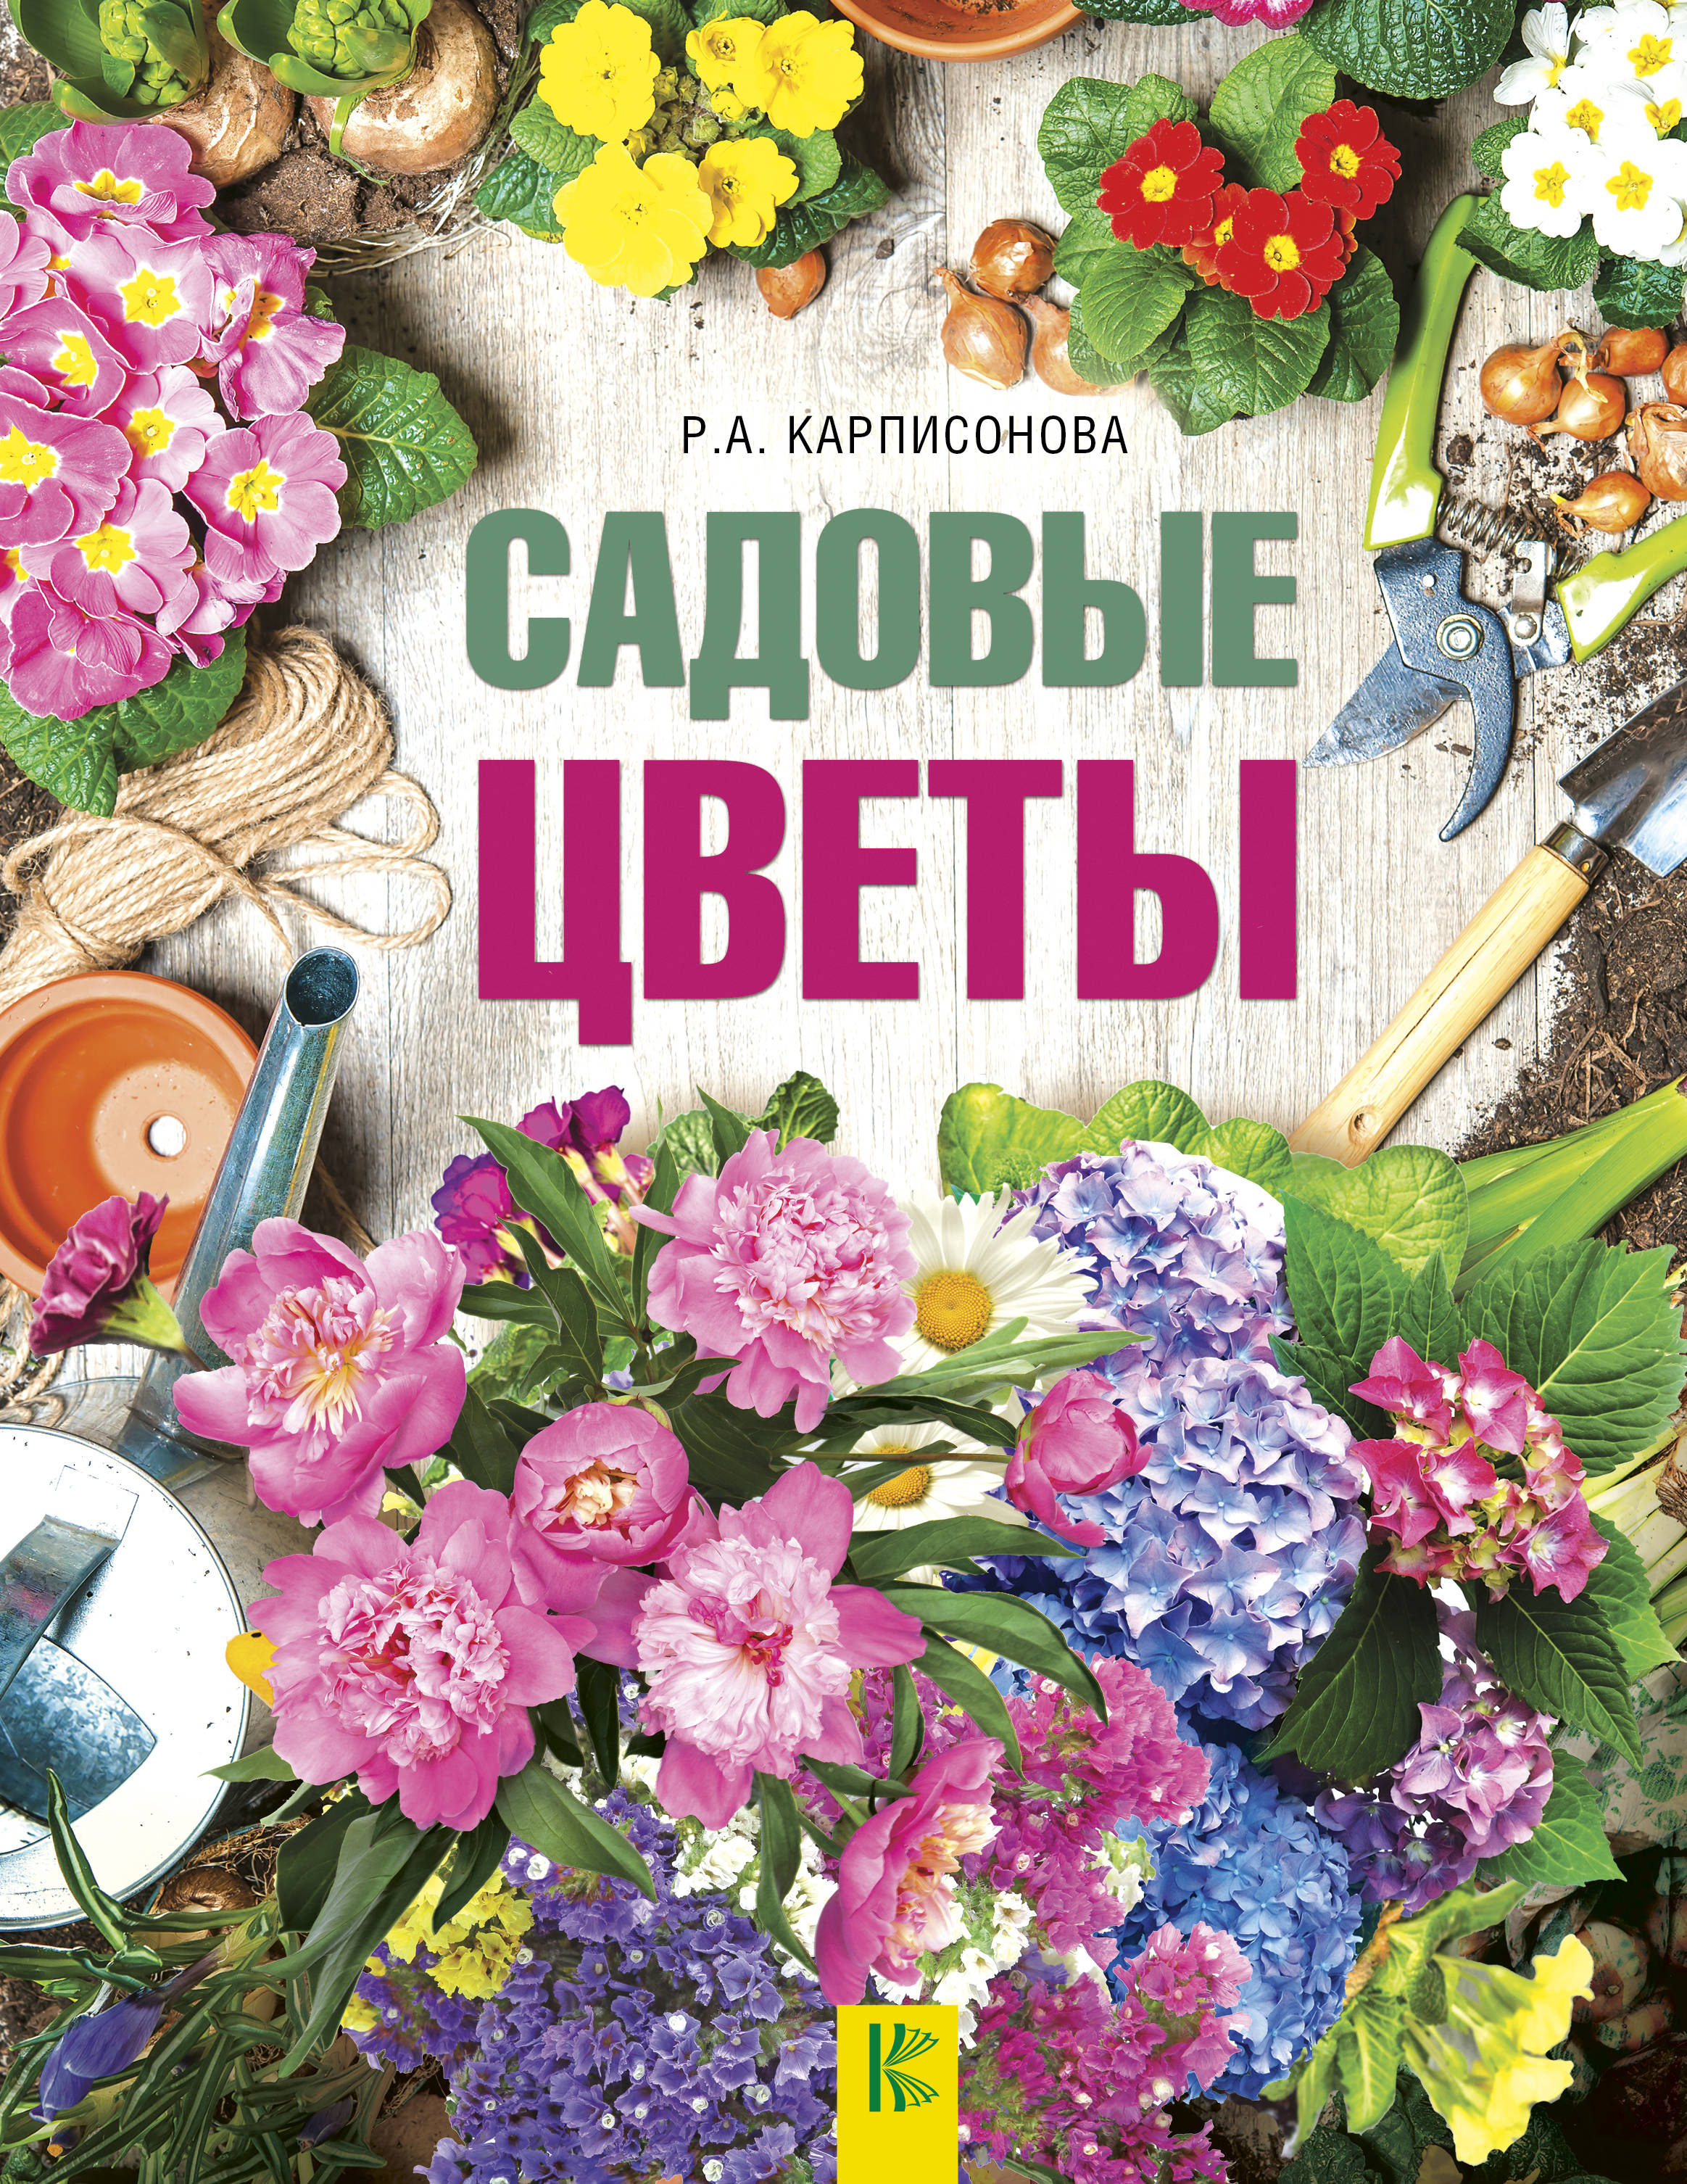 Р. А. Карписонова. Садовые цветы